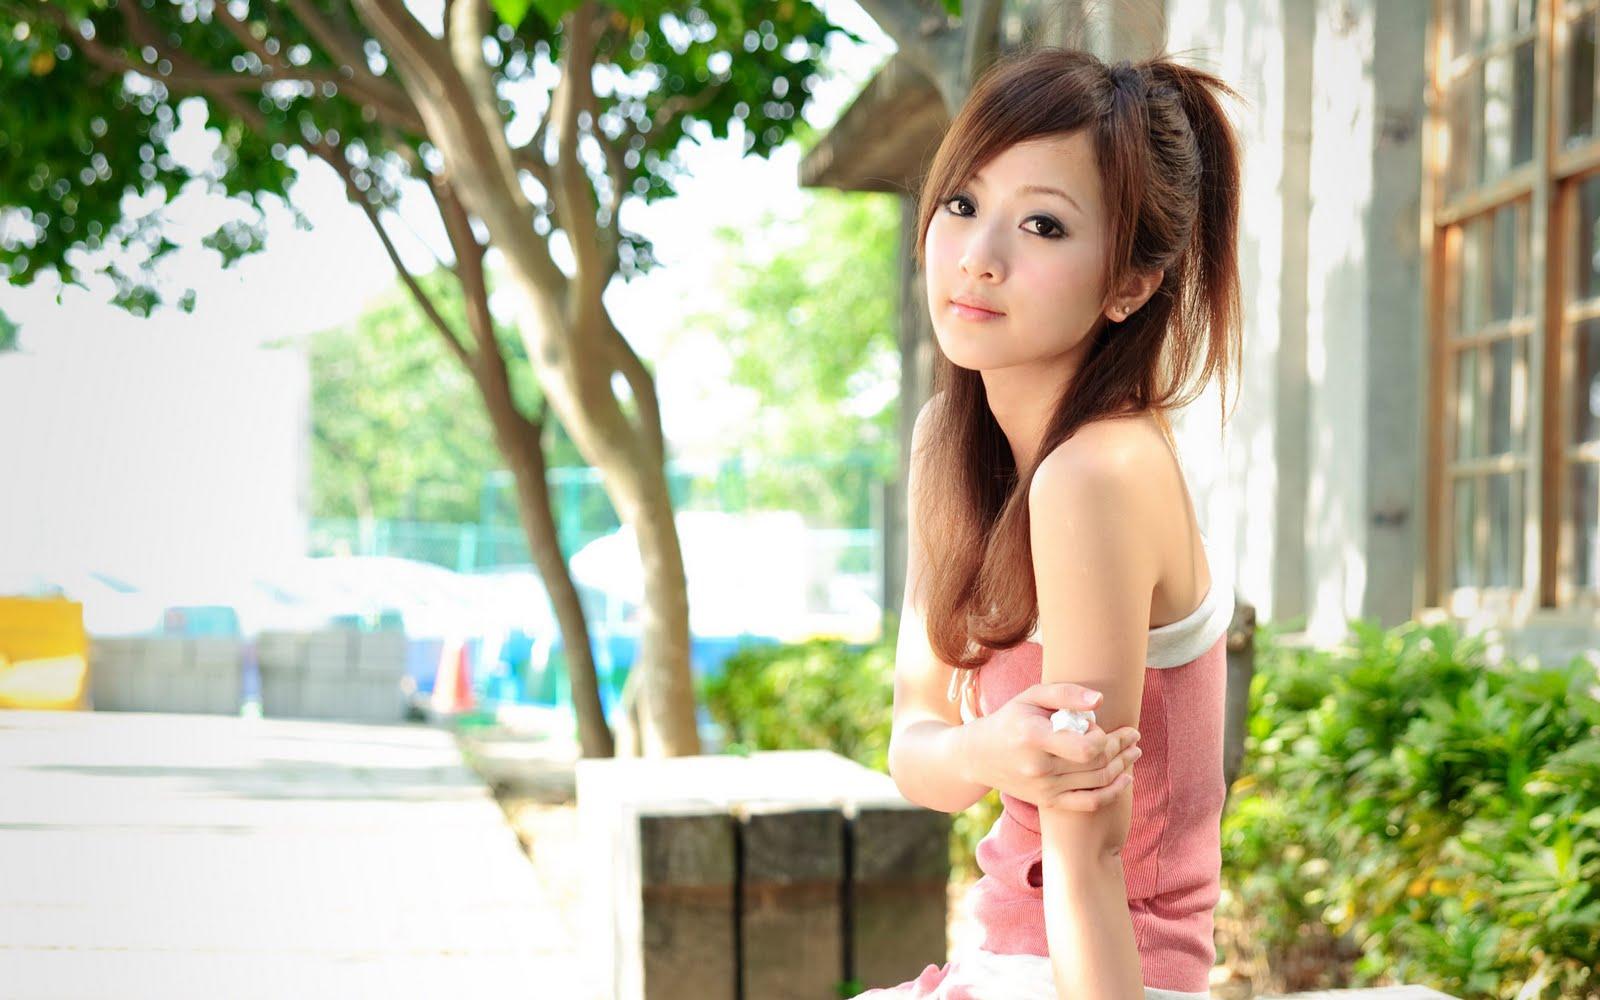 Cute Asian Girls HD Wallpapers HD Wallpapers Backgrounds Photos 1600x1000